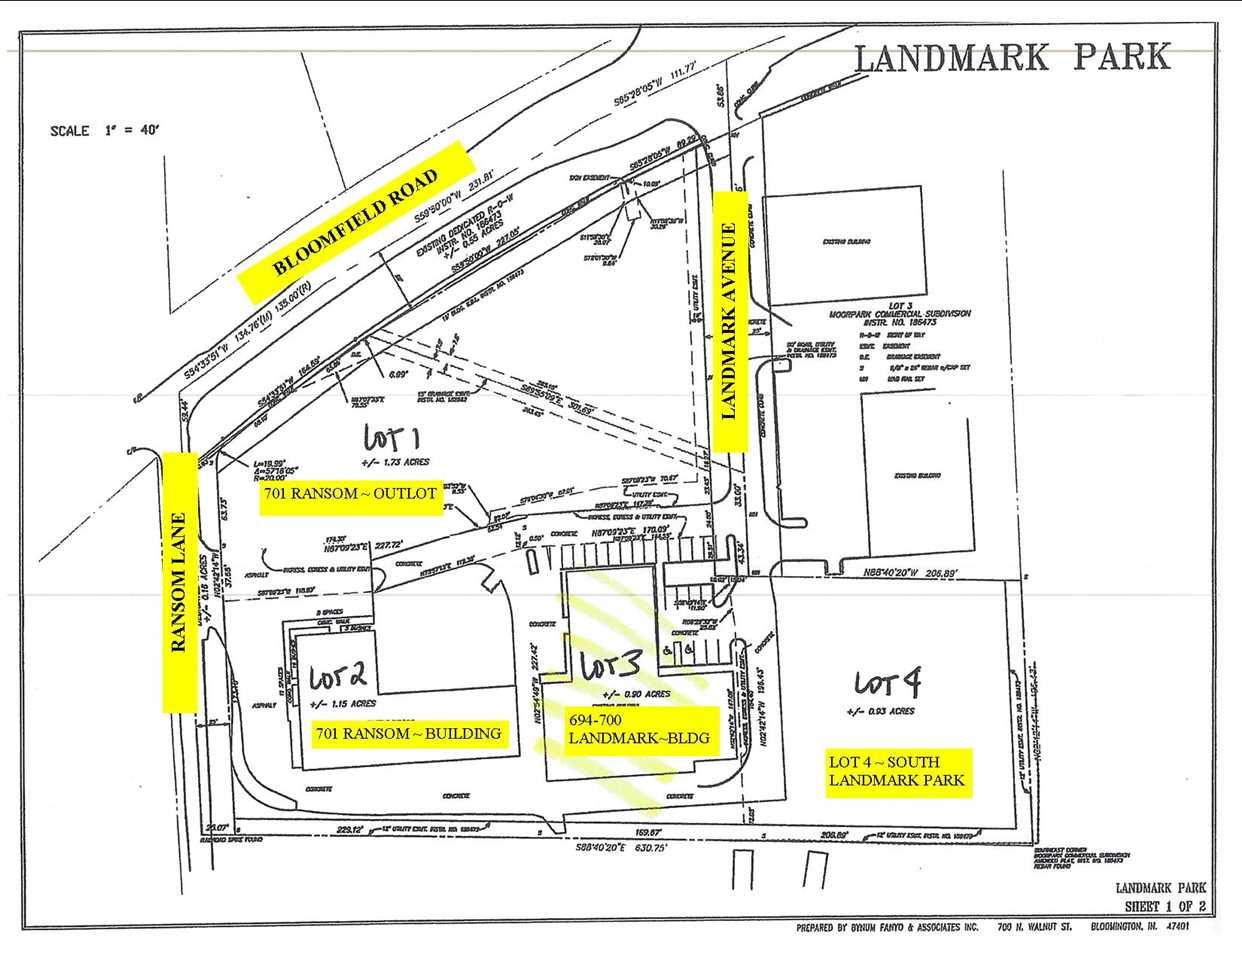 Landmark Park Bloomington, IN 47403